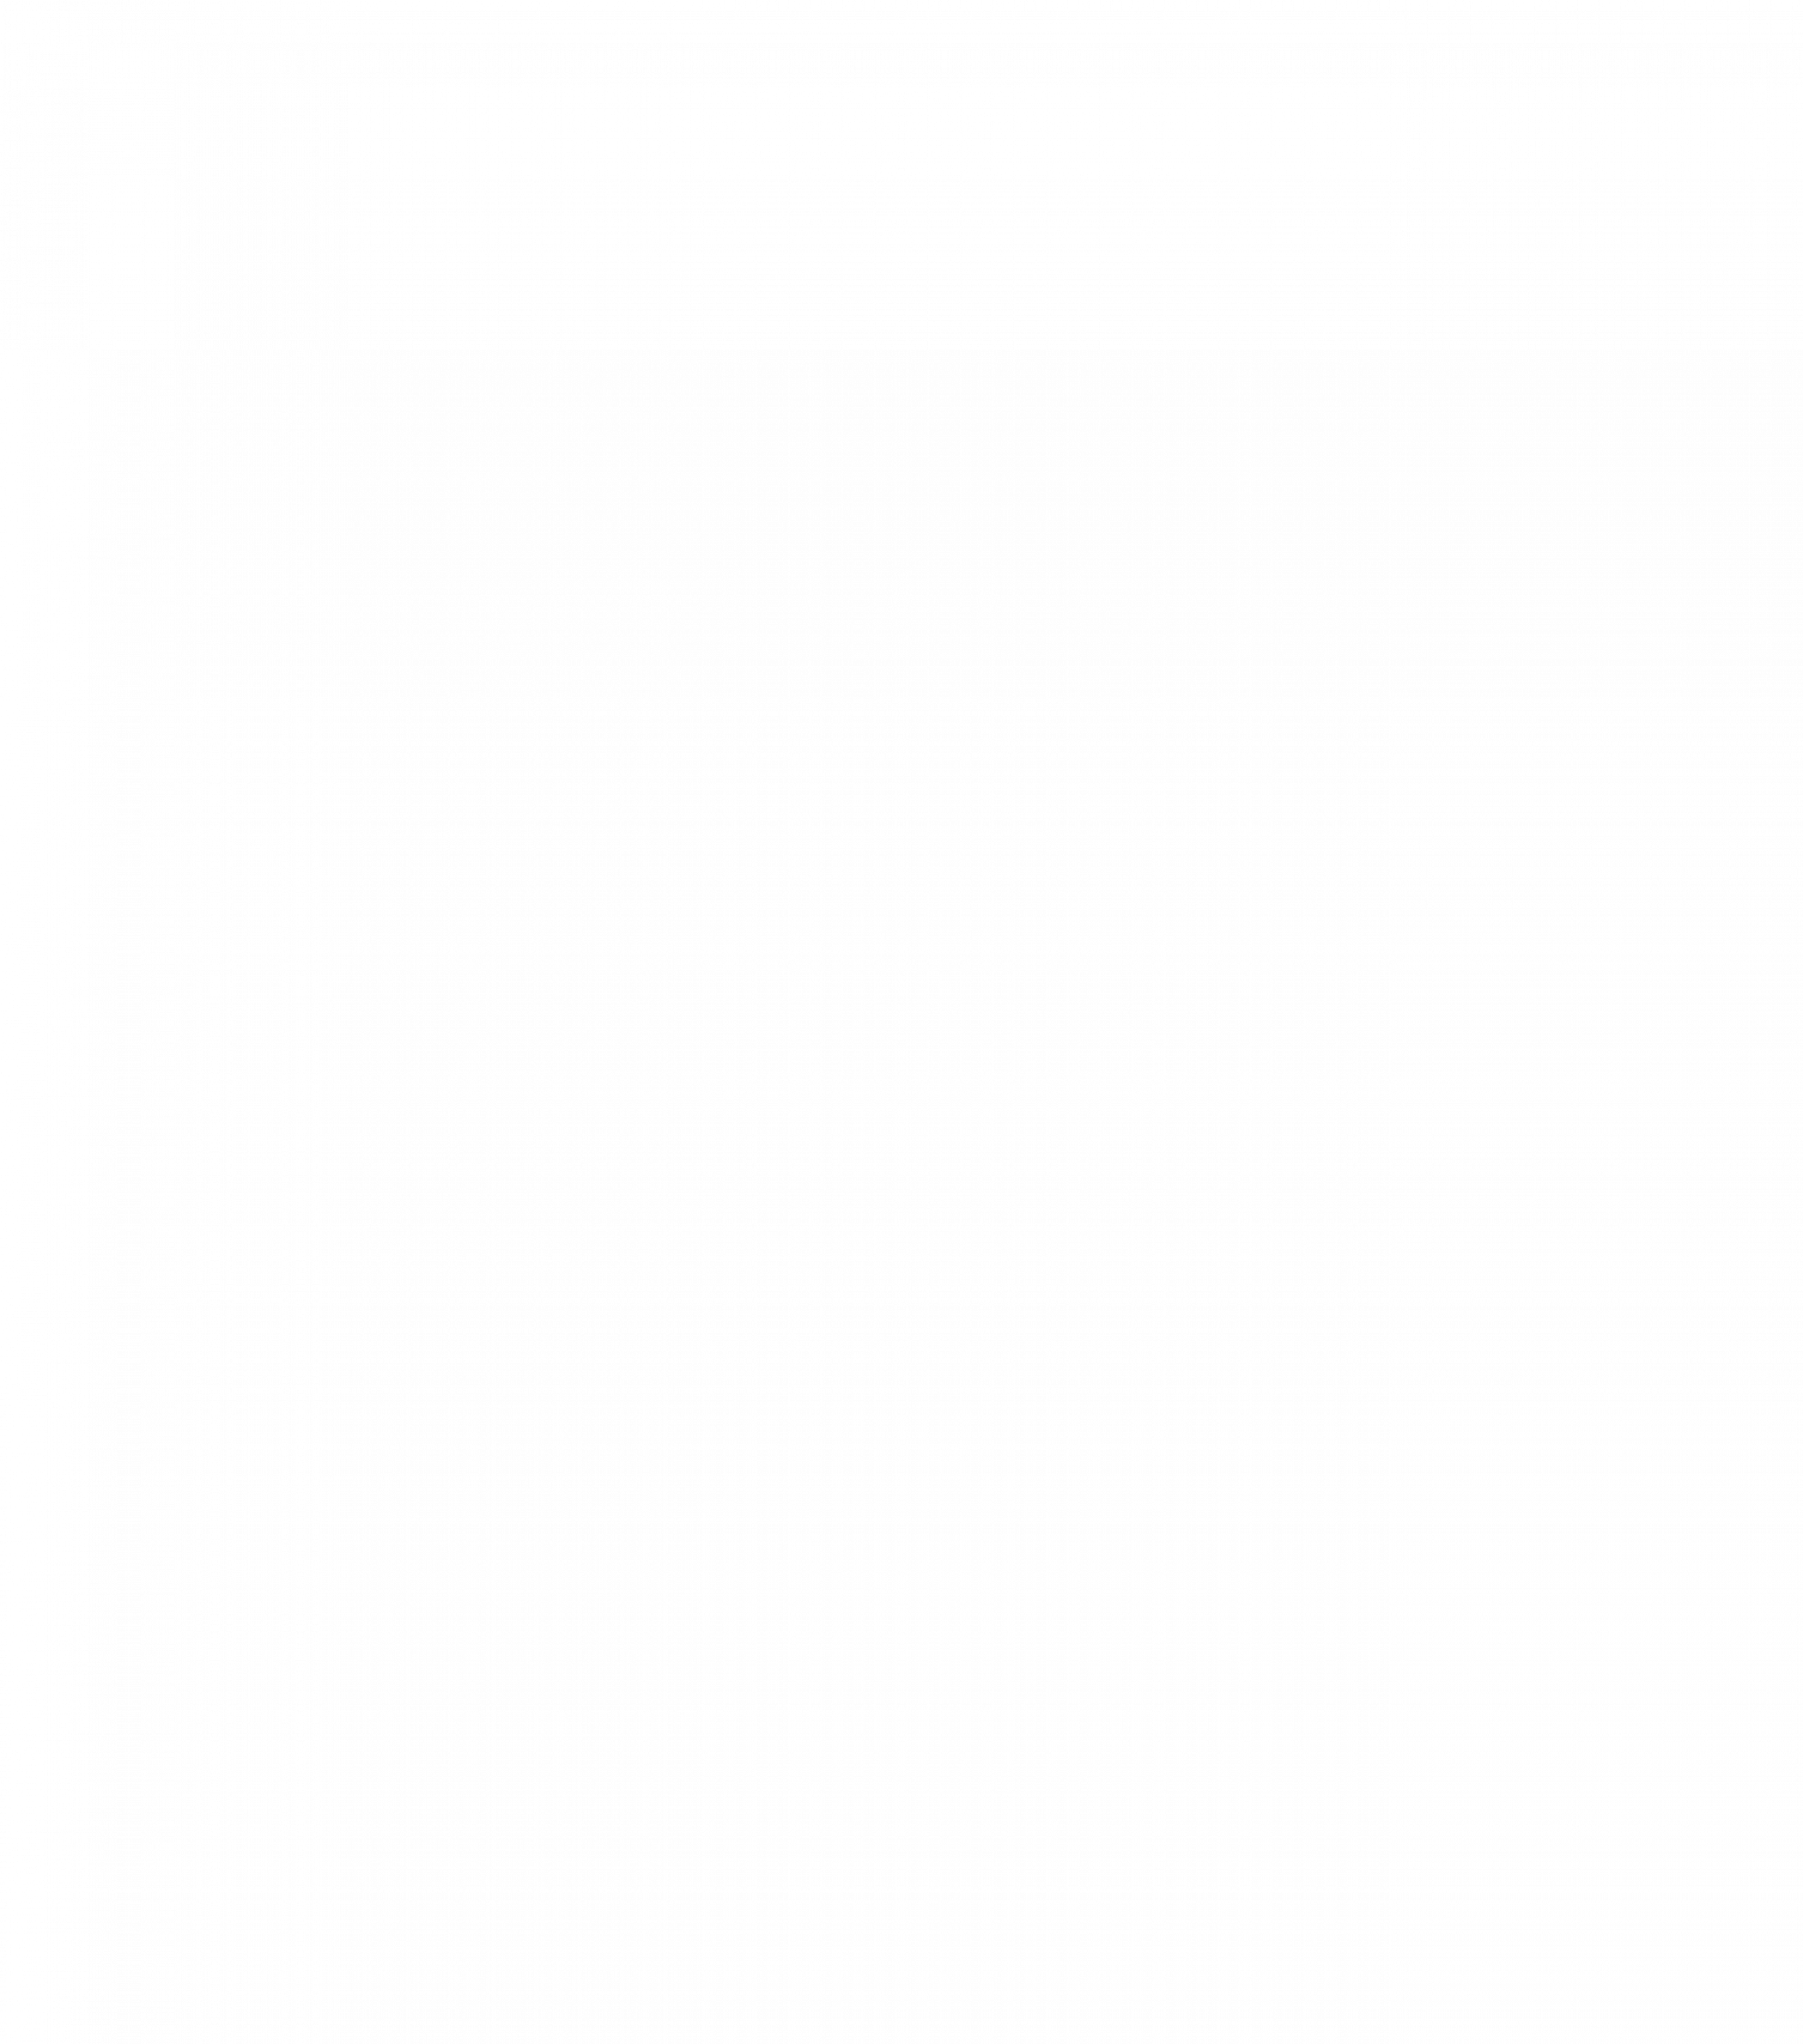 mac-atom-xl-front-side-400px